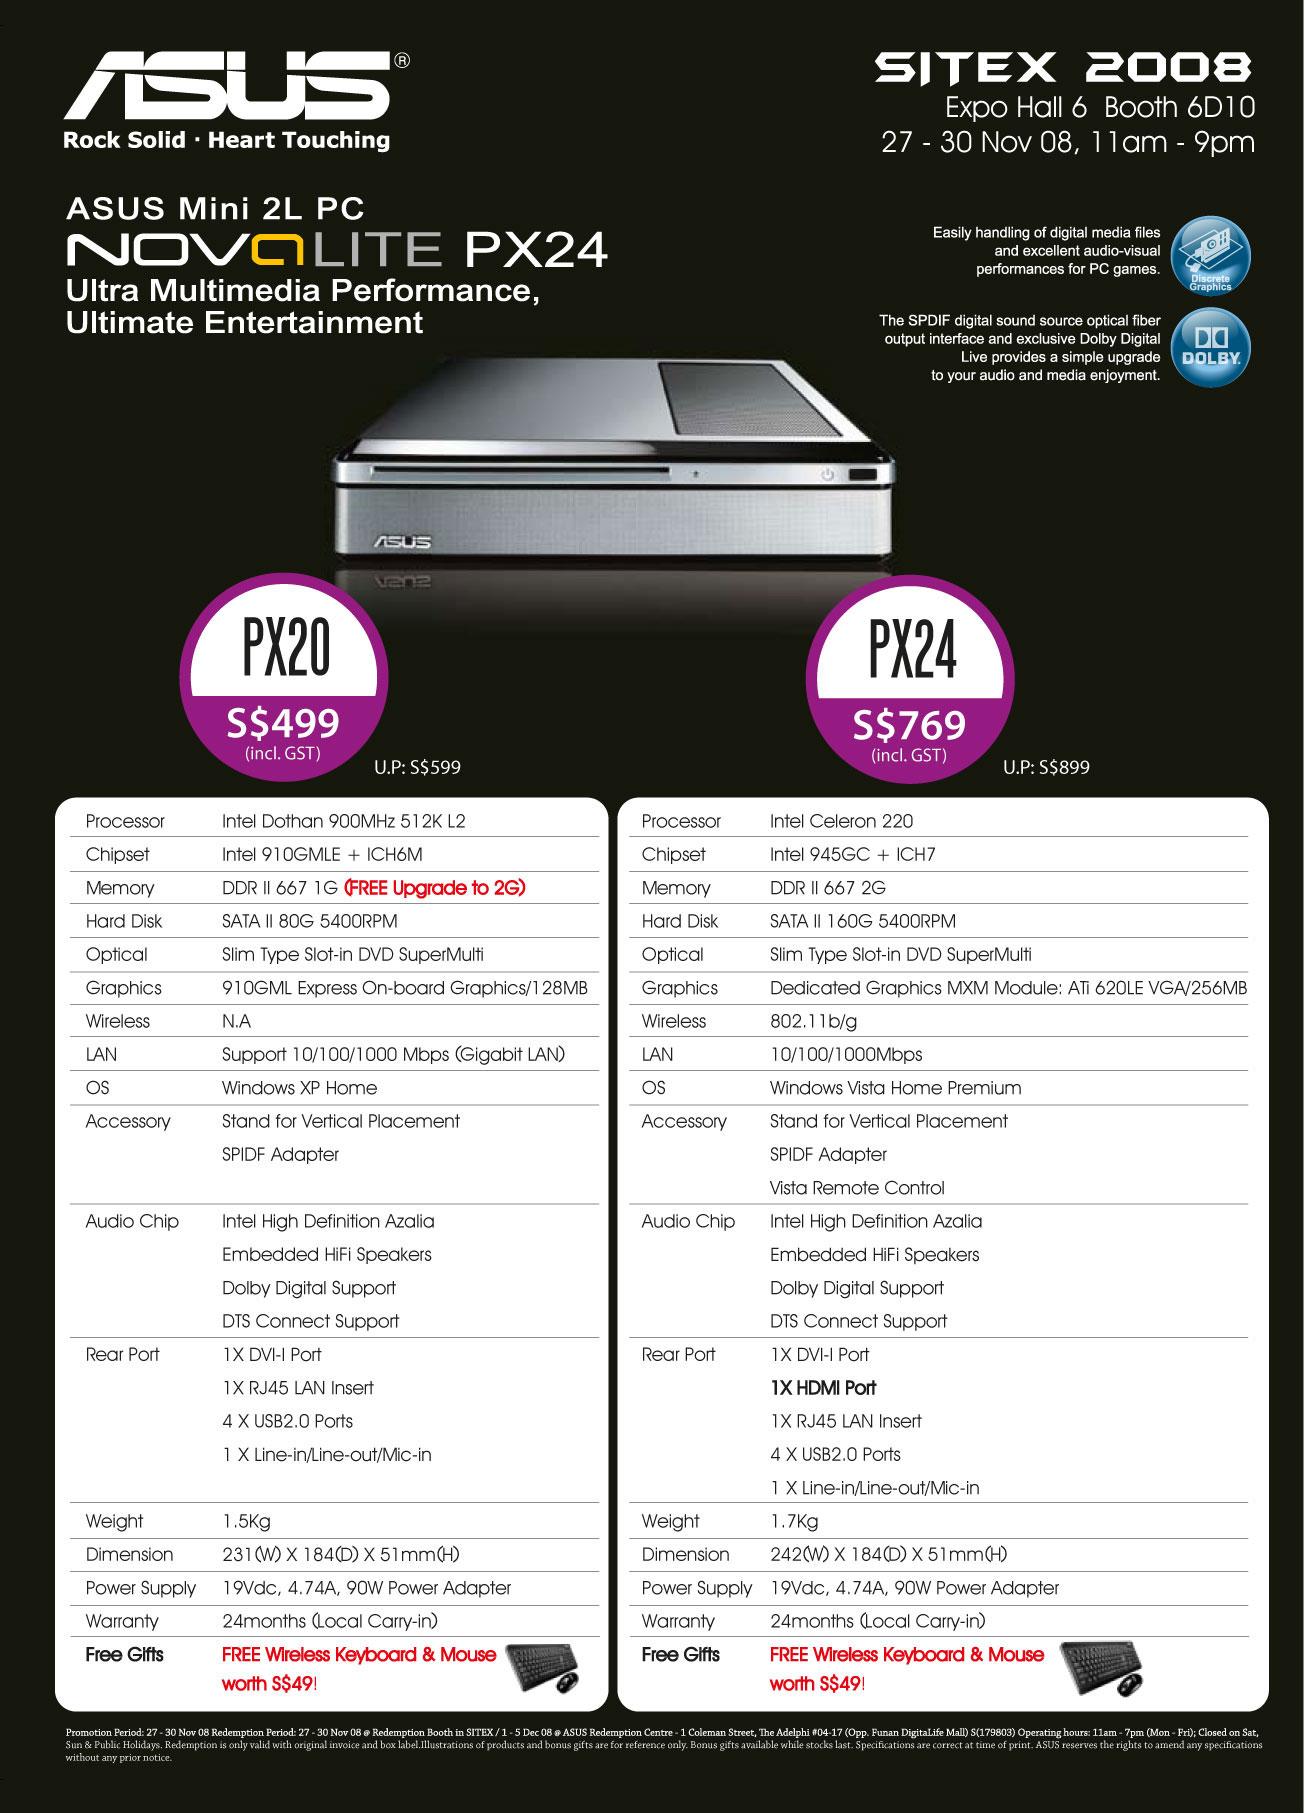 Sitex 2008 price list image brochure of Asus Mini 2l Pc Nova Lite SITEX08 Nova LR